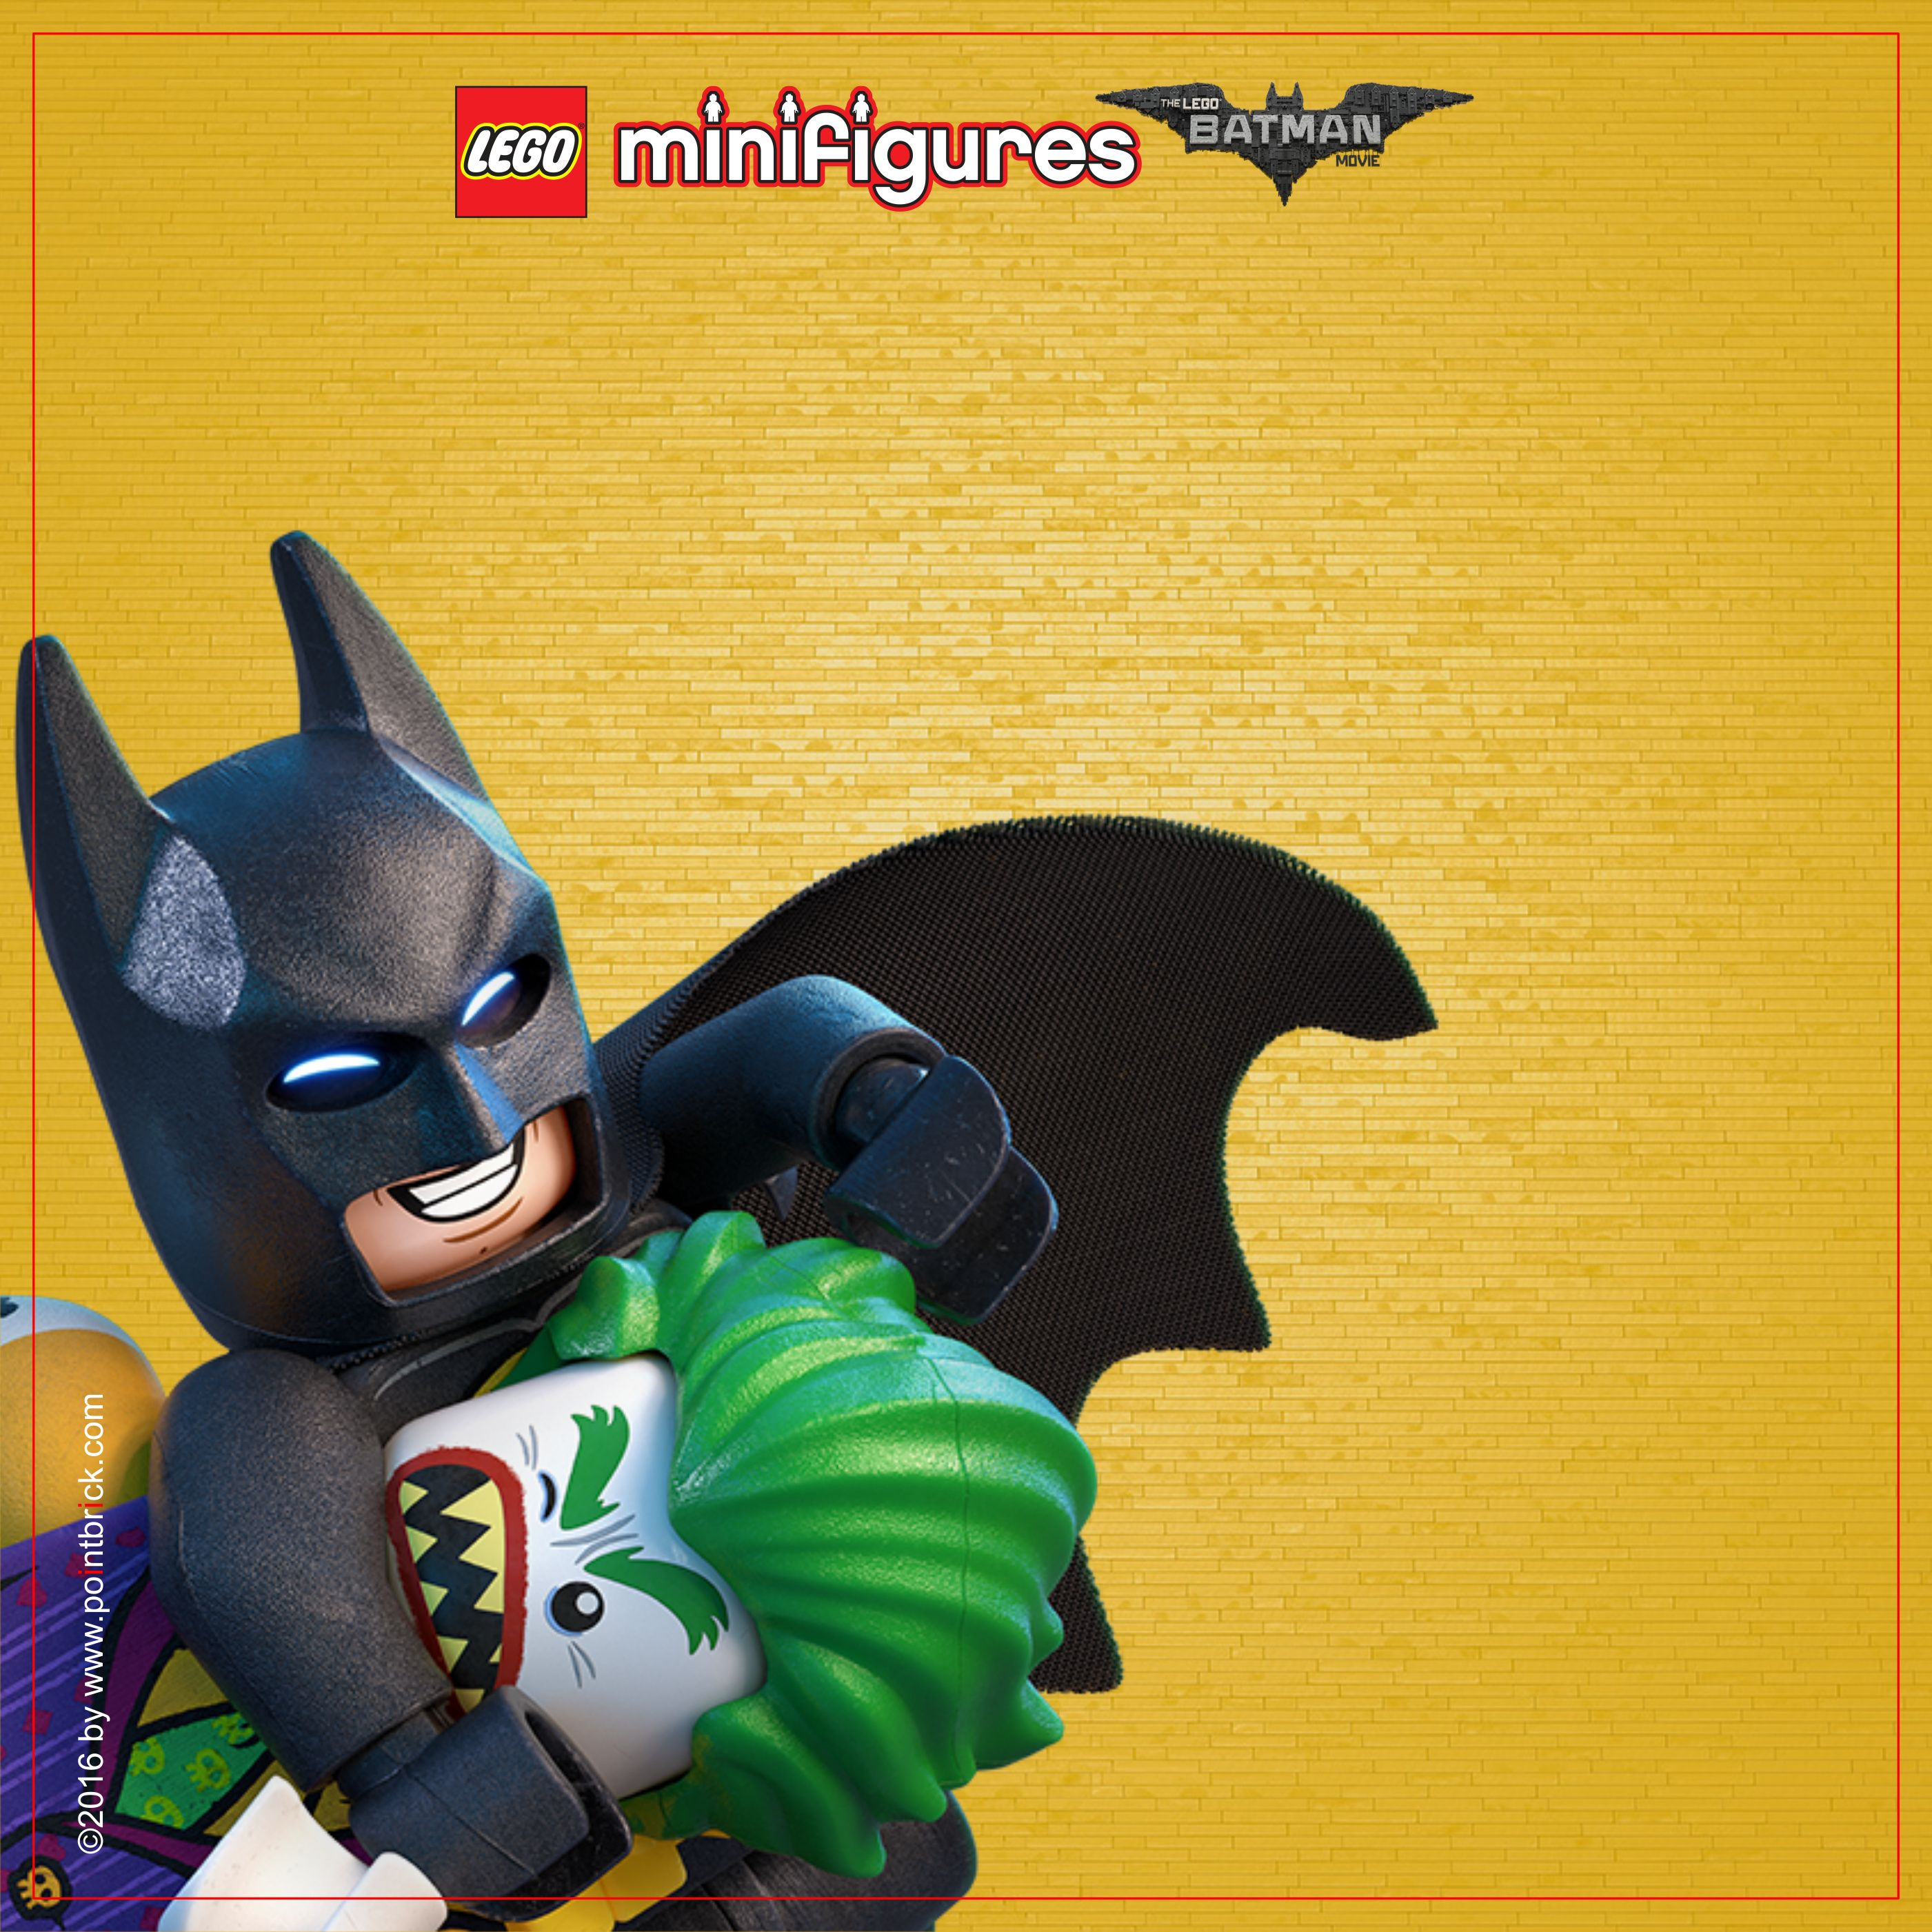 Lego minifigures display sfondi lego batman movie for Sfondi batman